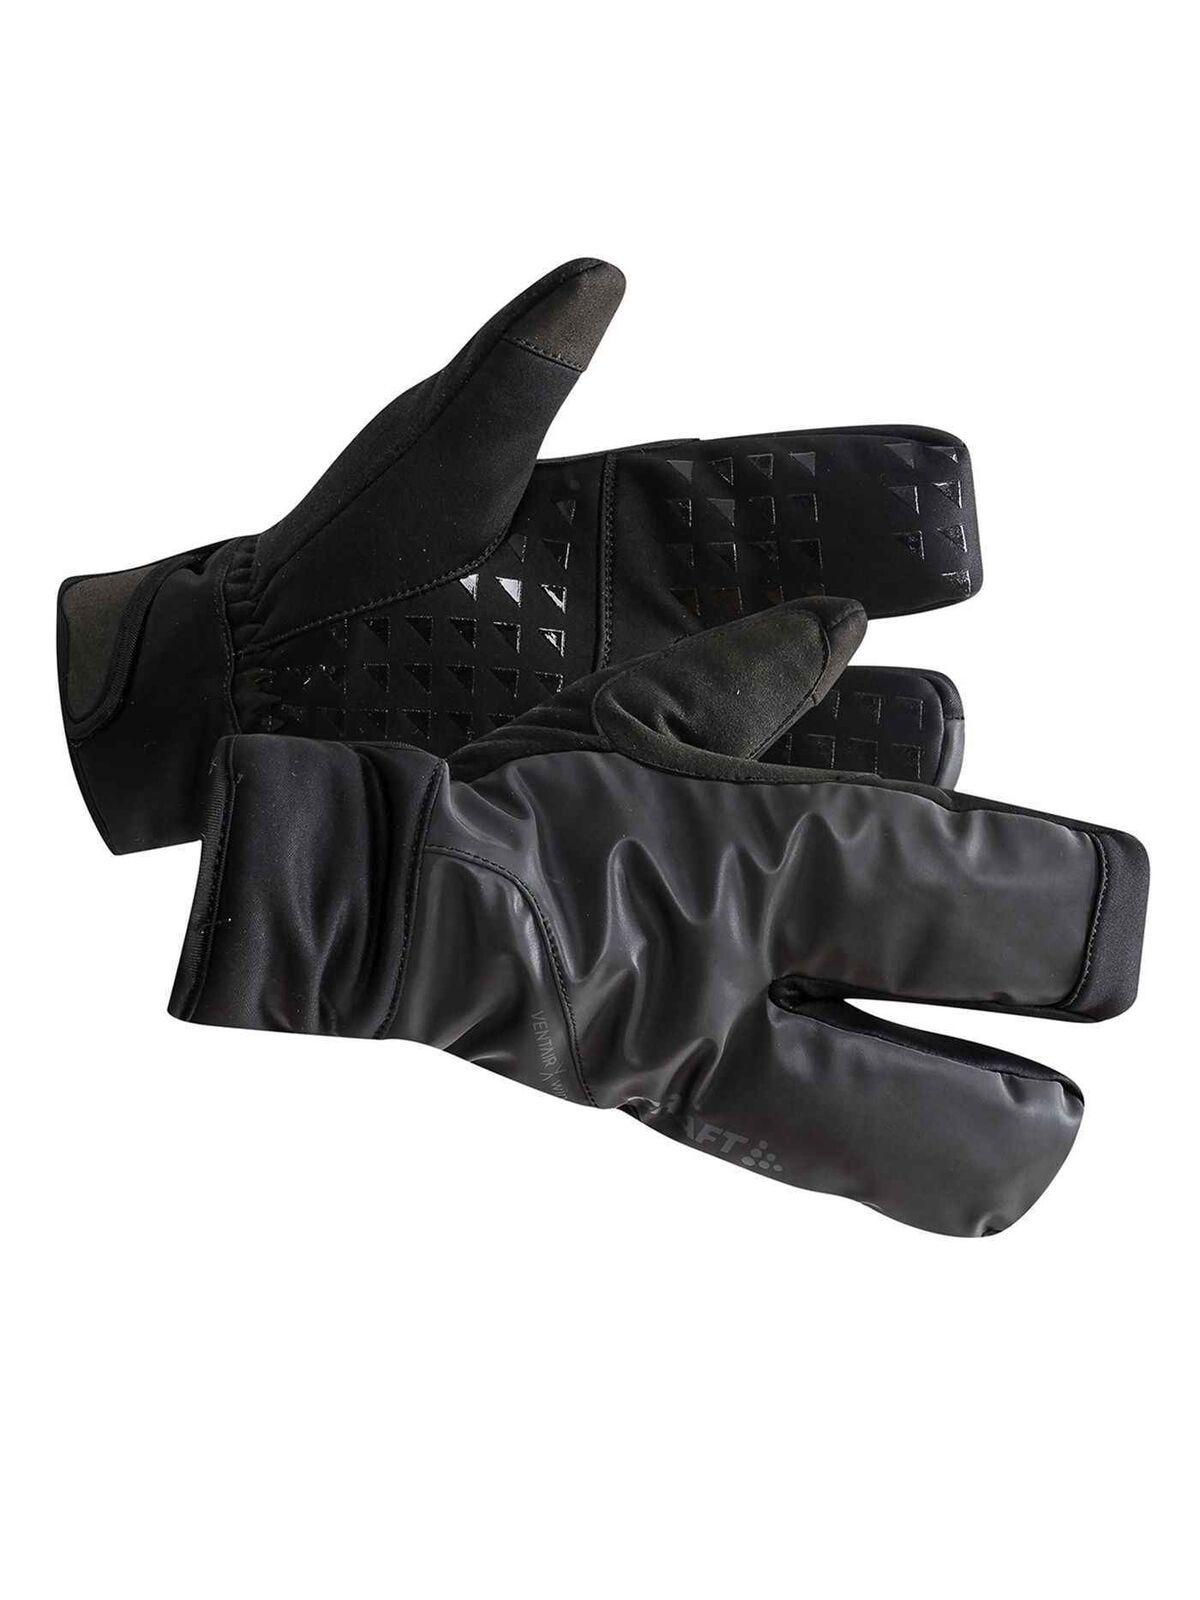 CRAFT NEU Damen Siberian 2.0 Split Finger Gloves NEU CRAFT & OVP ea6097